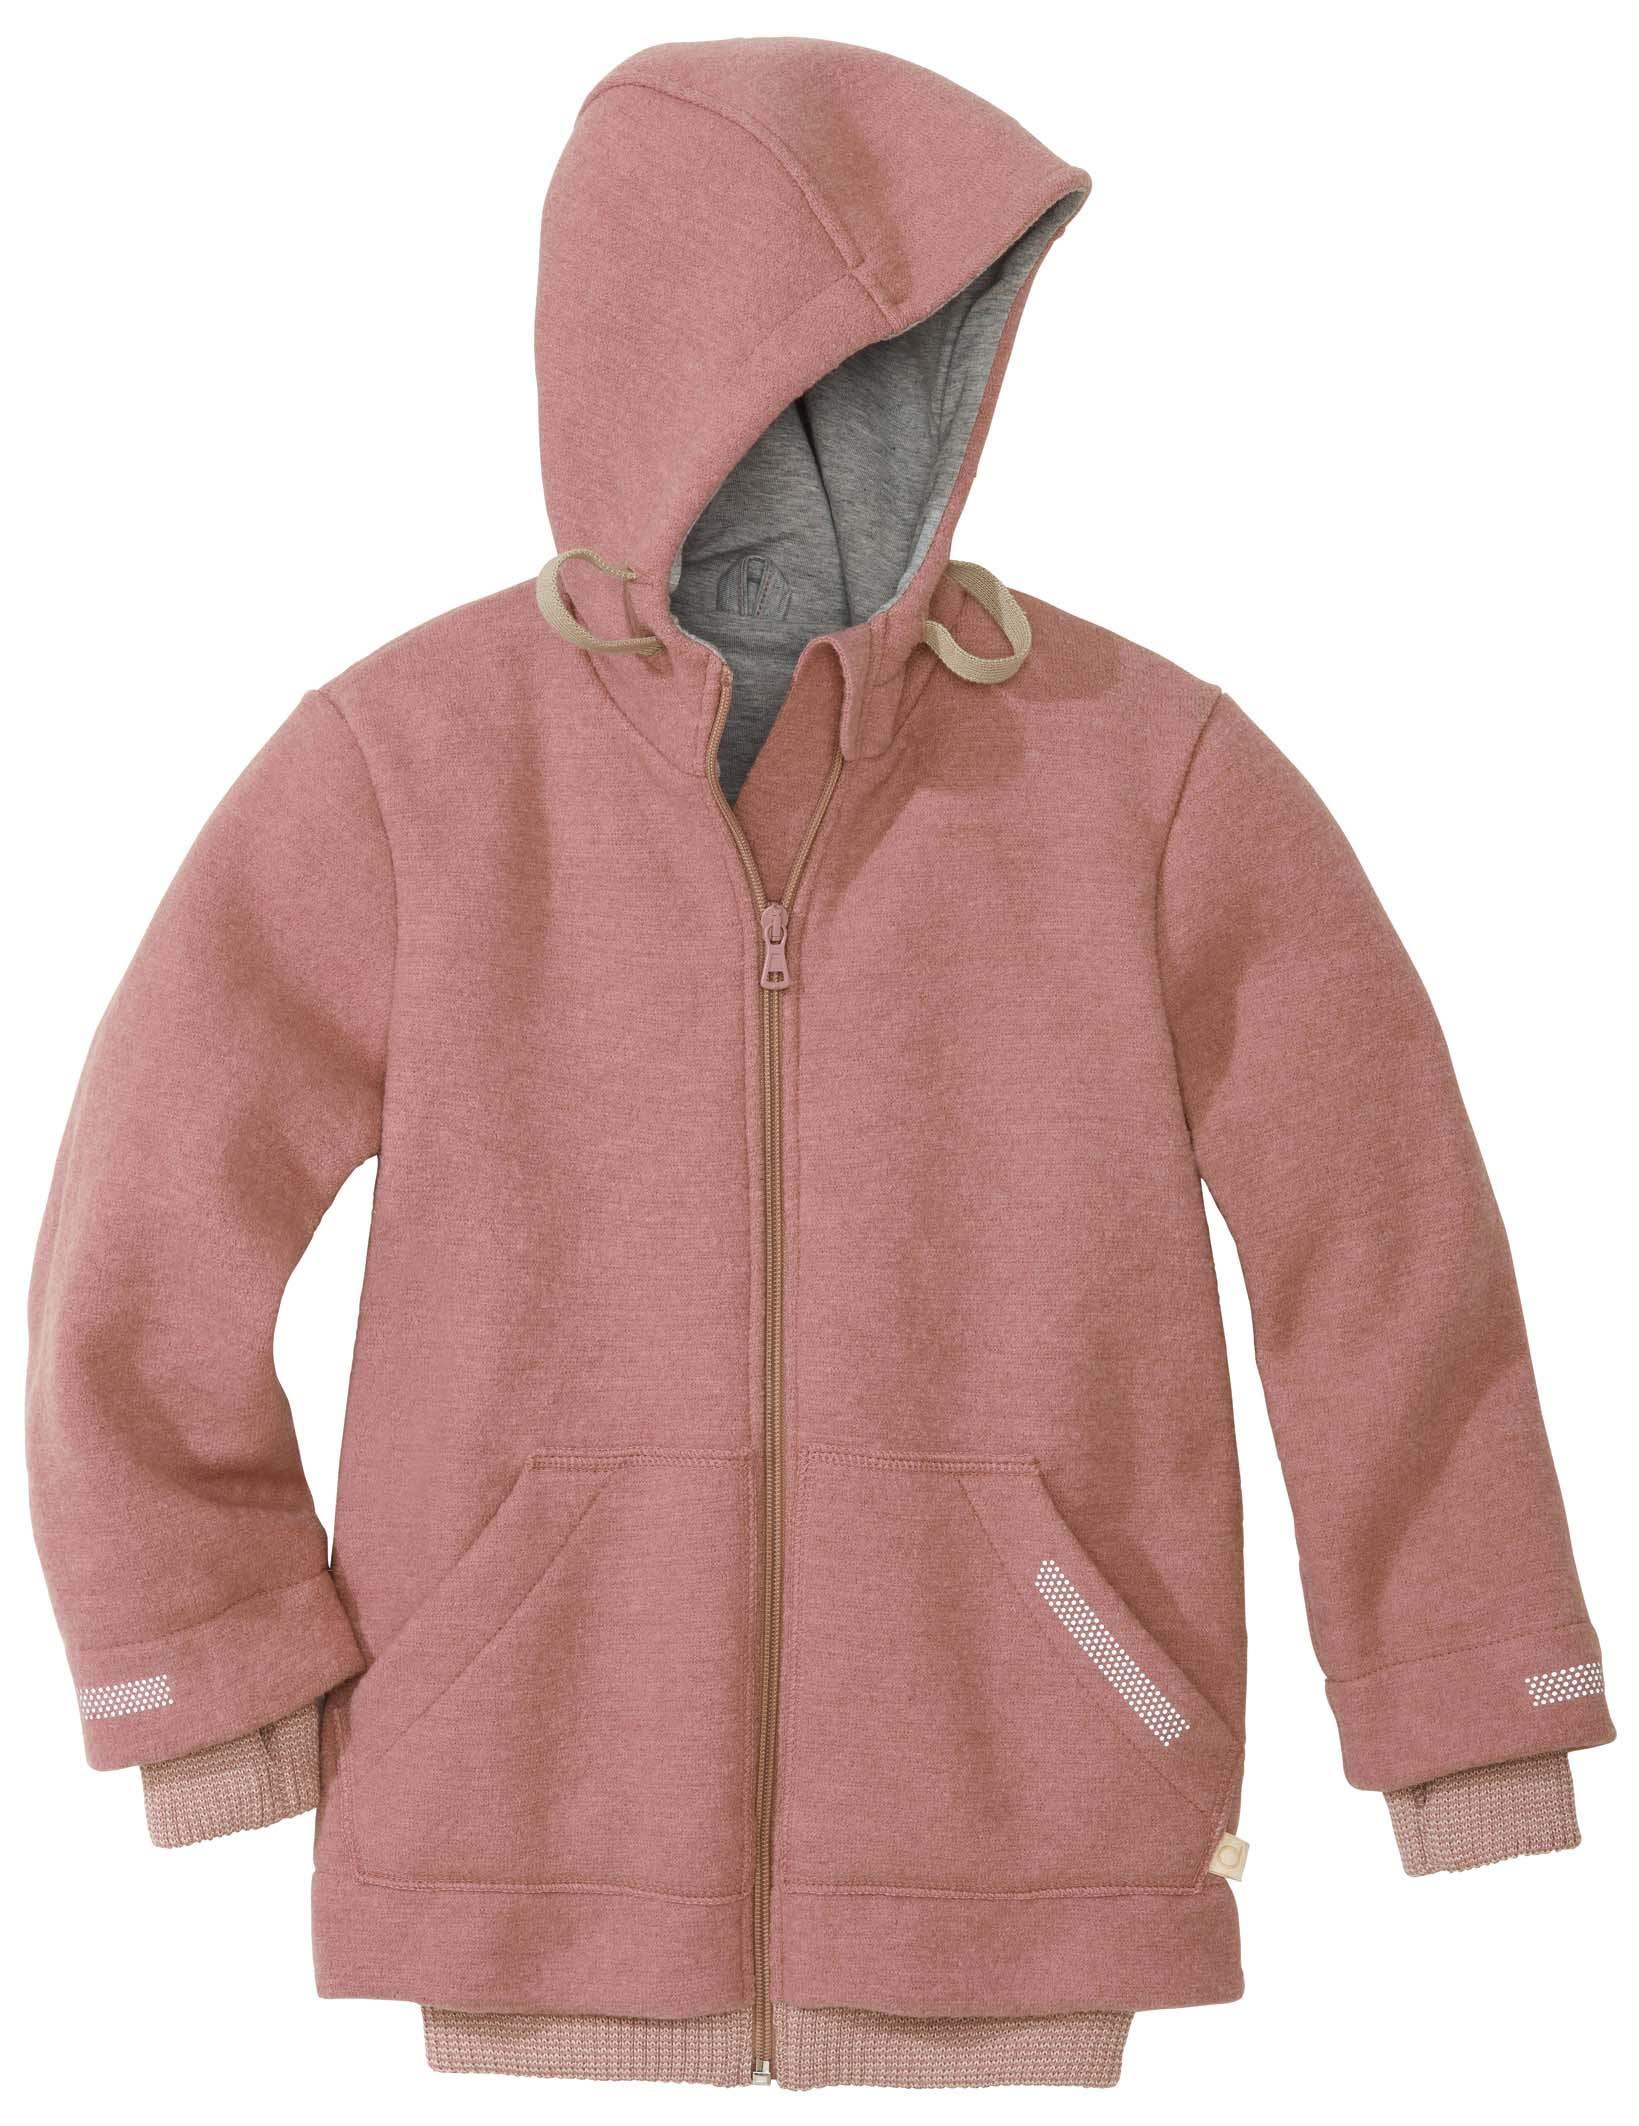 Disana Outdoor Jacket in Rose 100% Organic Merino Wool Made in Germany (110/116, Rose)